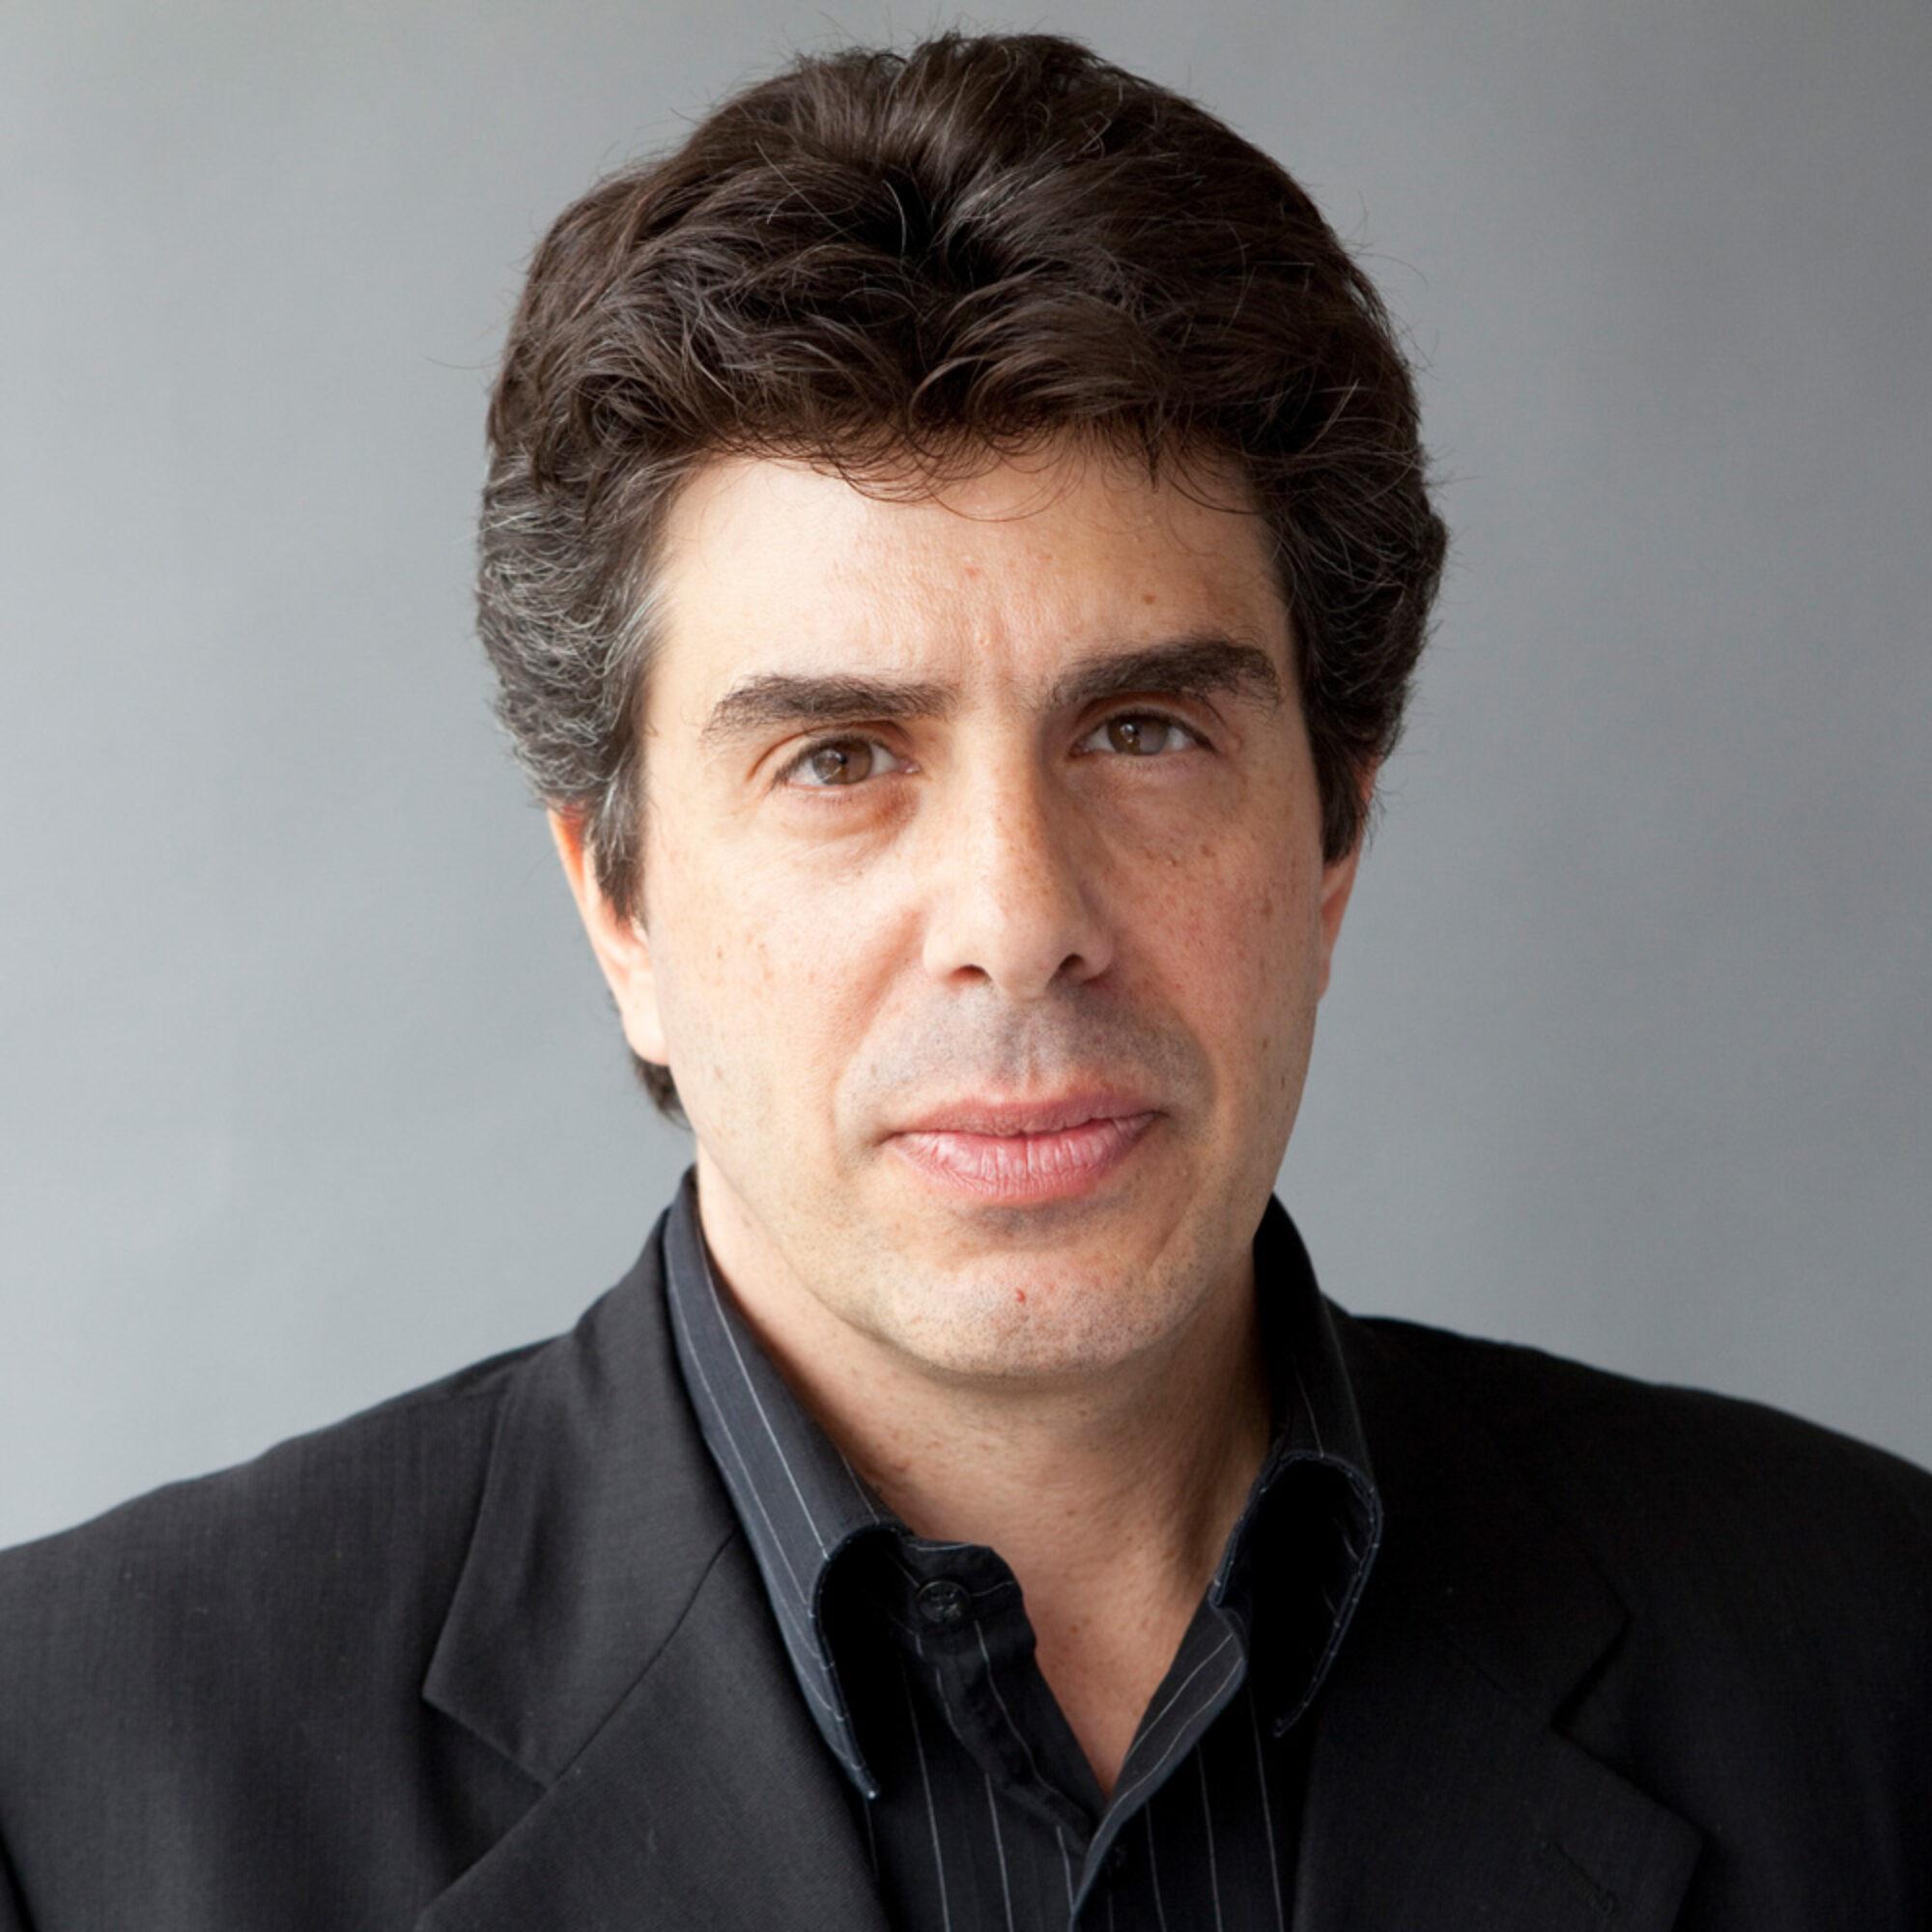 Sebastian Rotella